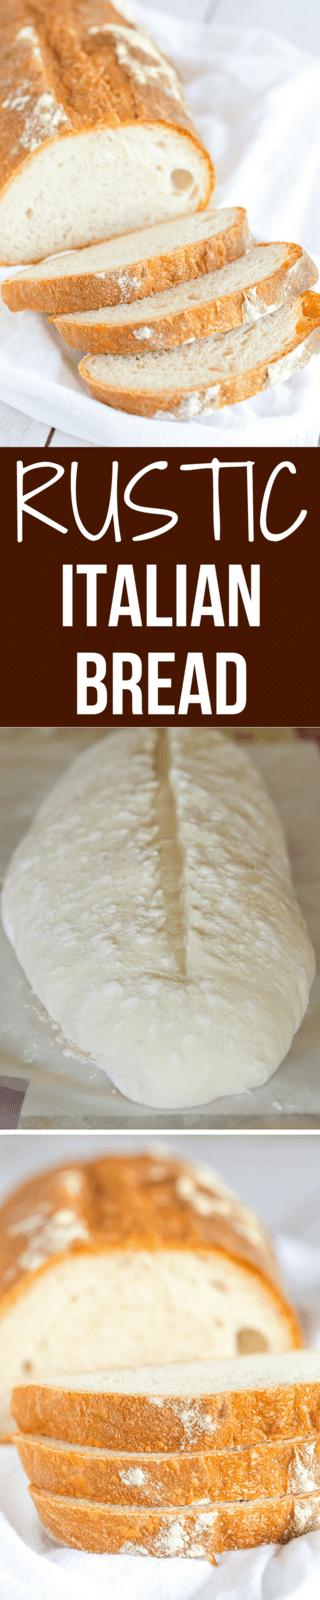 Rustic Italian Bread | Recipe | Rustic italian bread ...